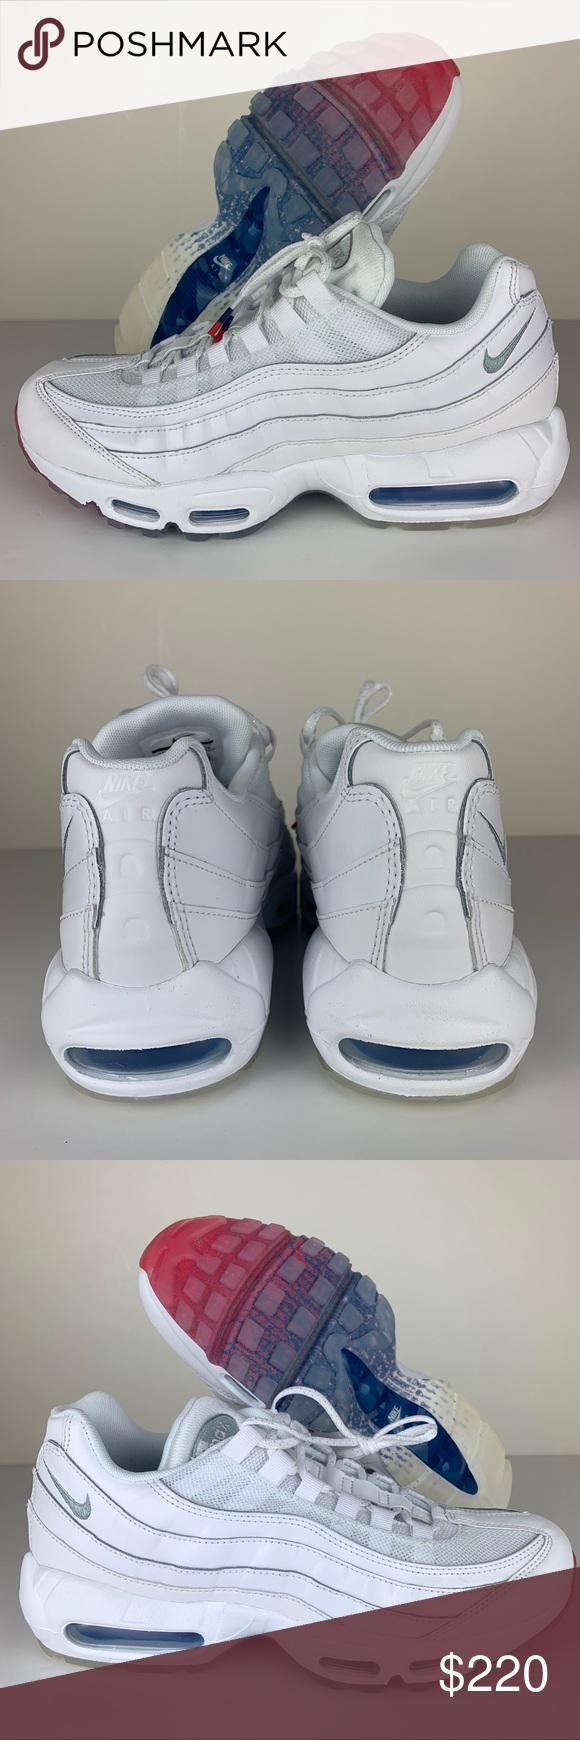 5bdae4dd81 Nike Air Max 95 Fourth of July Glacier Blue White NIKE AIR MAX 95